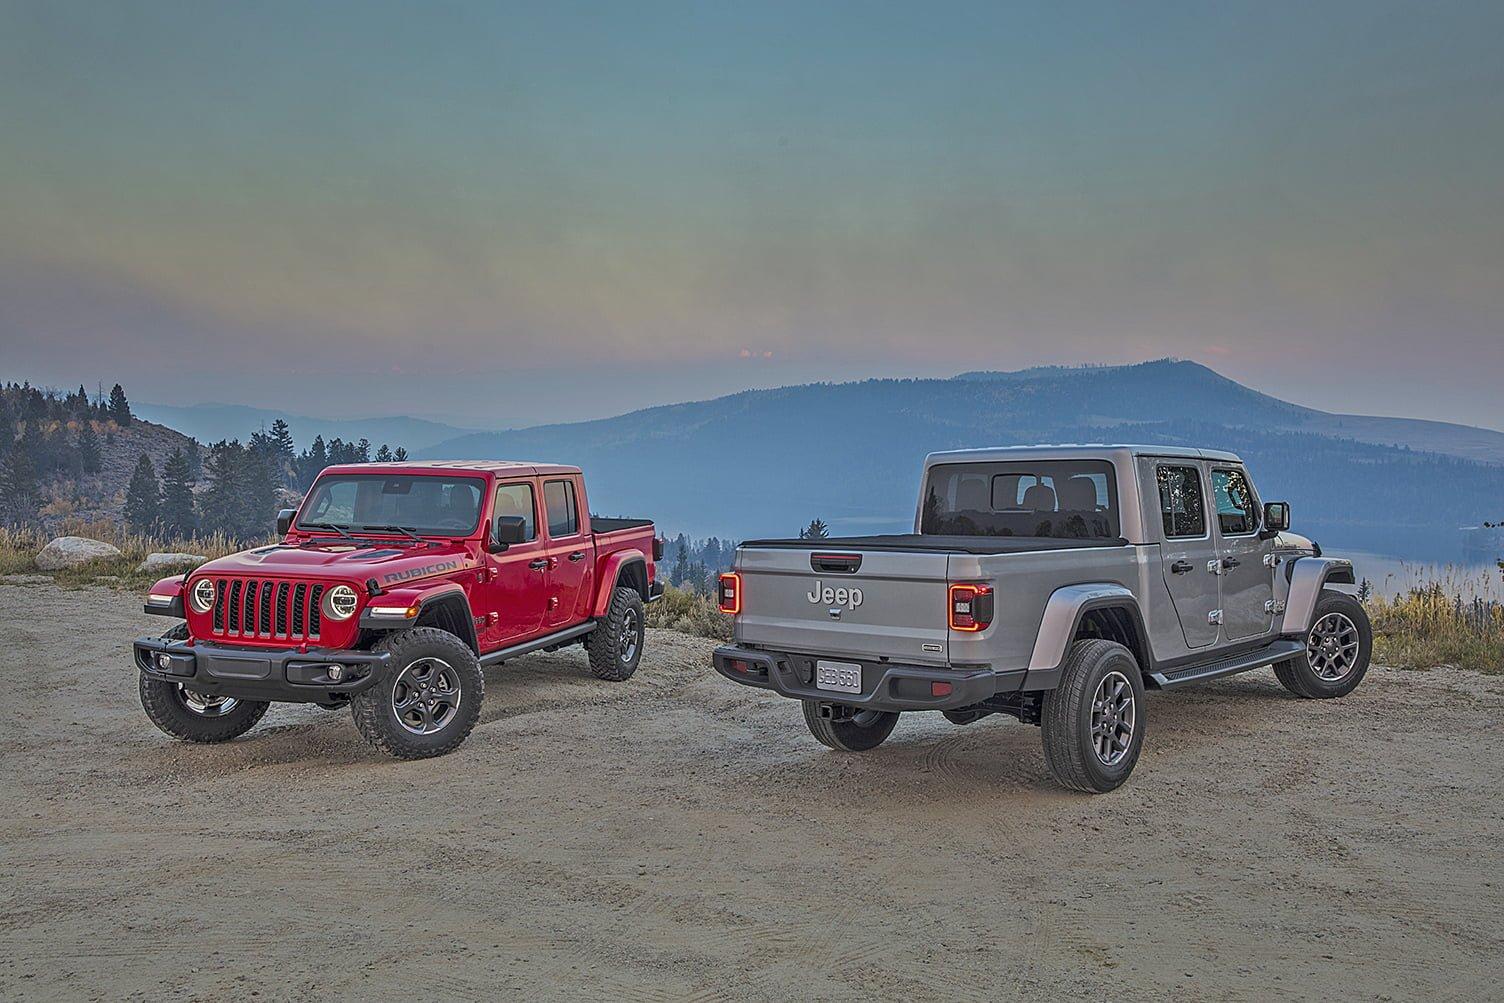 2021 Jeep Gladiator and Wrangler Get New EcoDiesel Engine